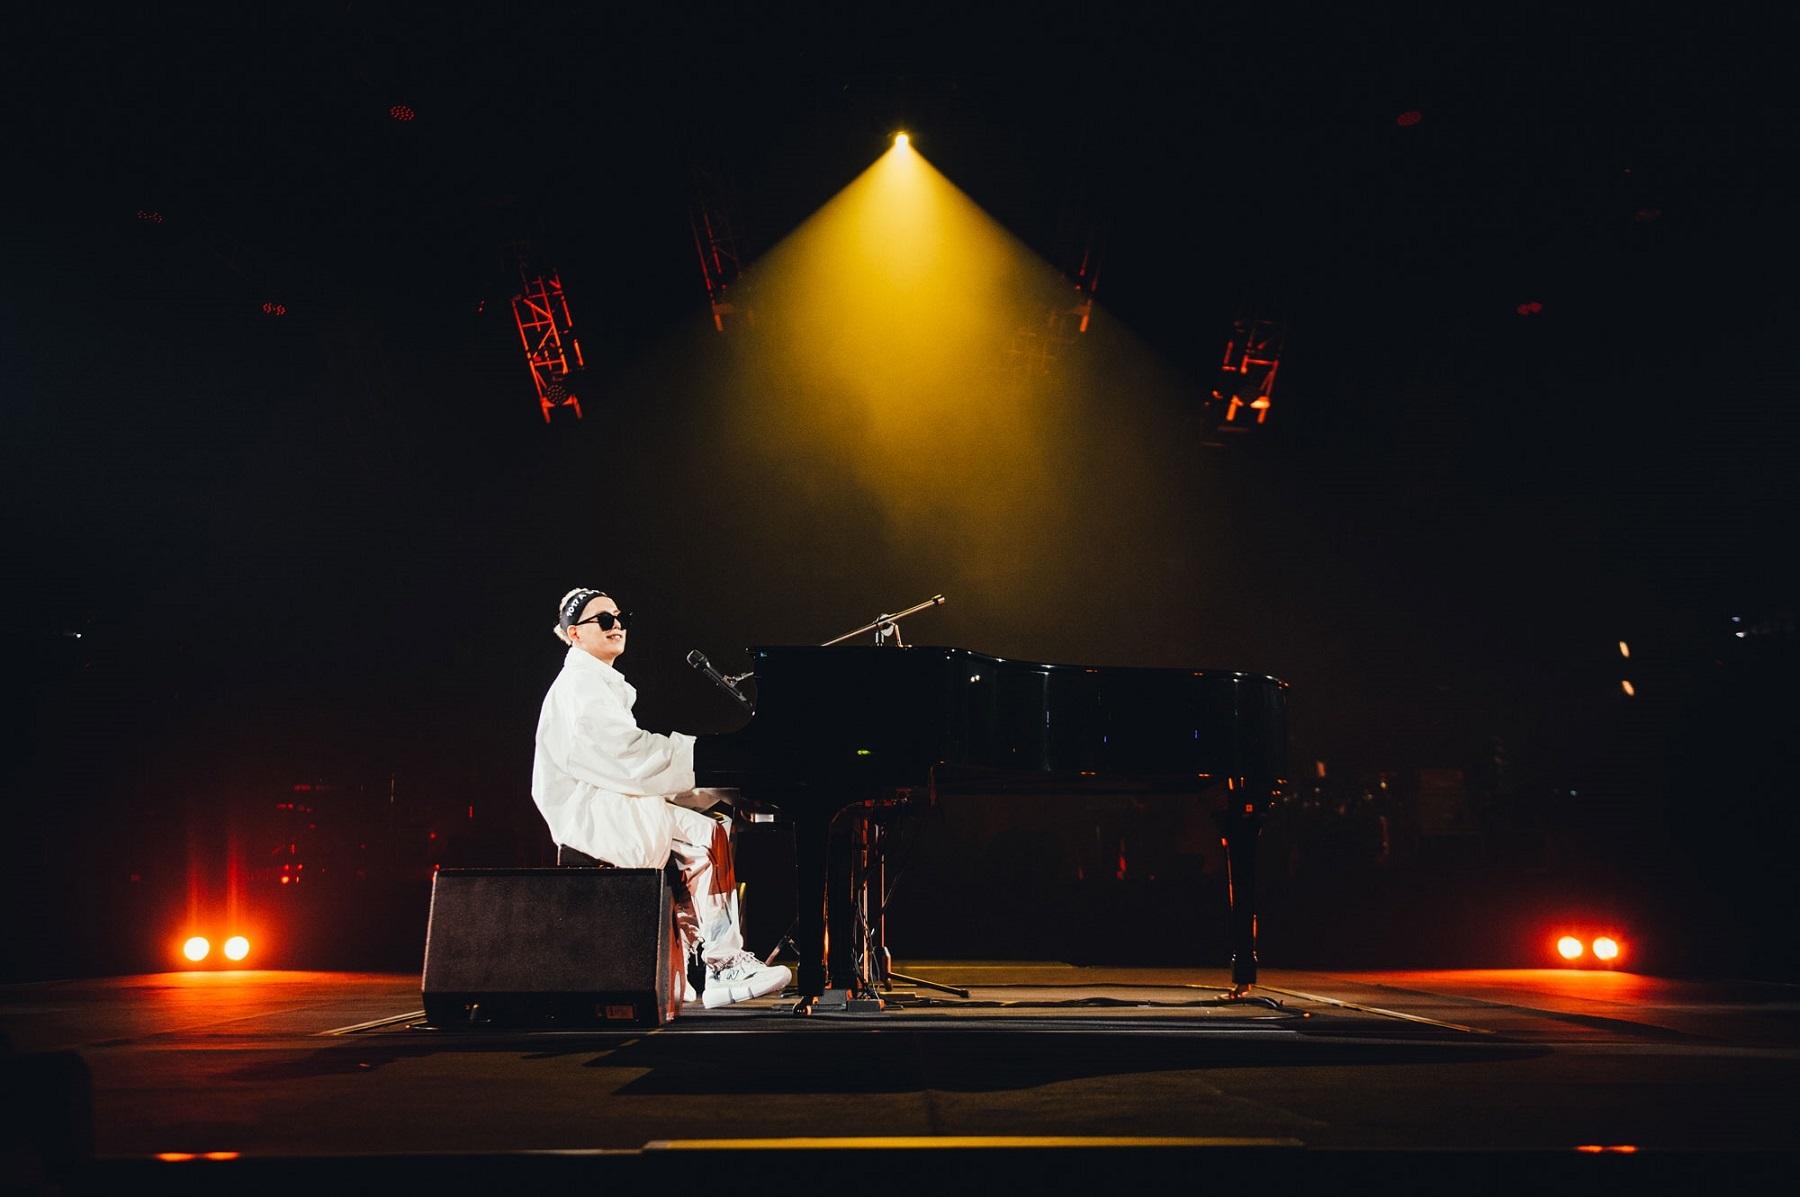 清水翔太『SHOTA SHIMIZU BUDOKAN LIVE 2020』